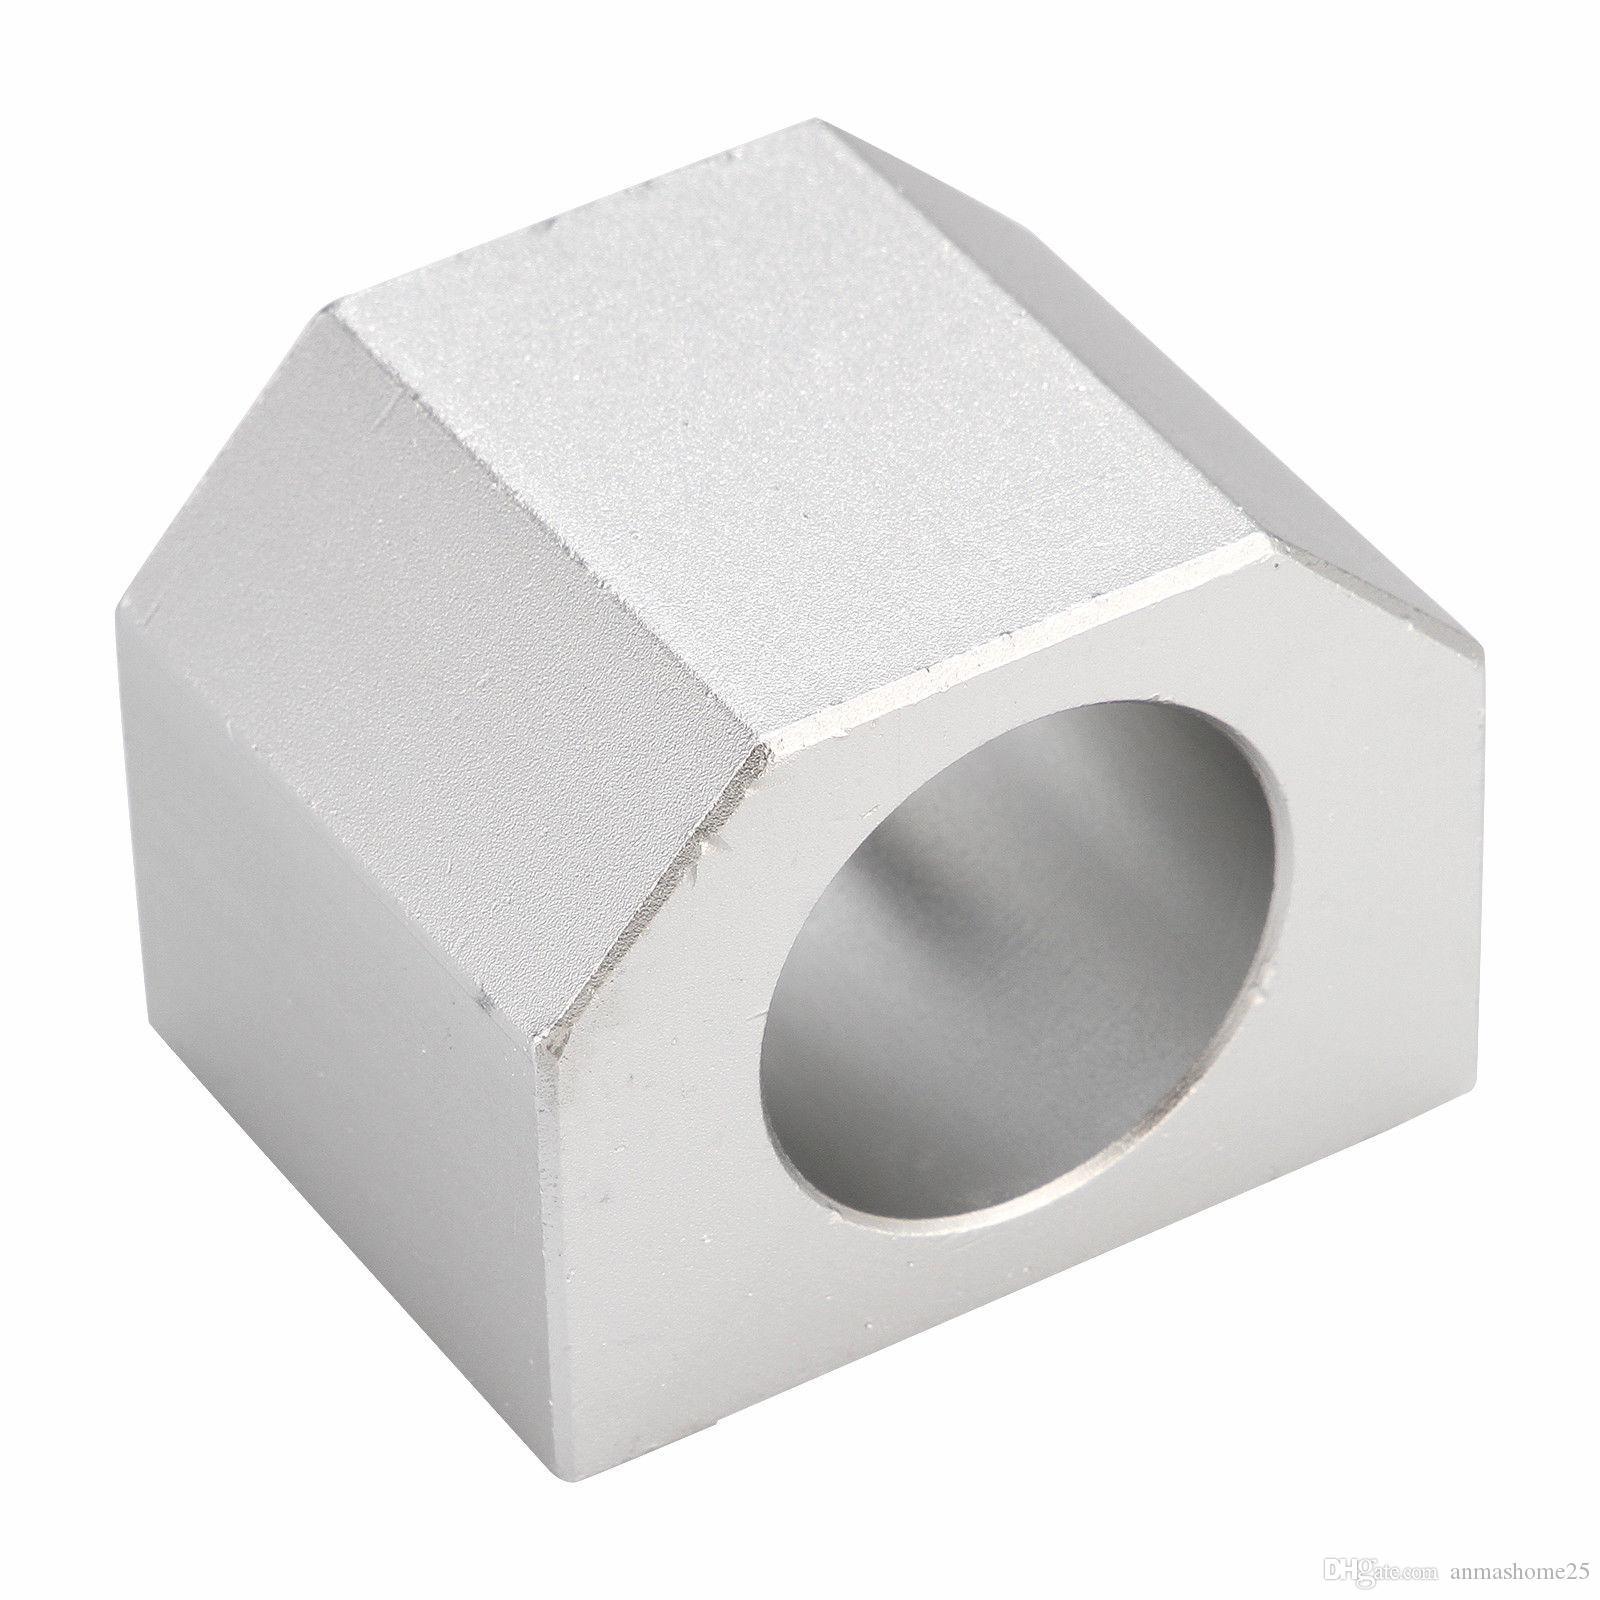 1 pcs DSG16H Ballscrew Nut Housing Seat Mount Bracket Holder For SFU1605 SFU1610